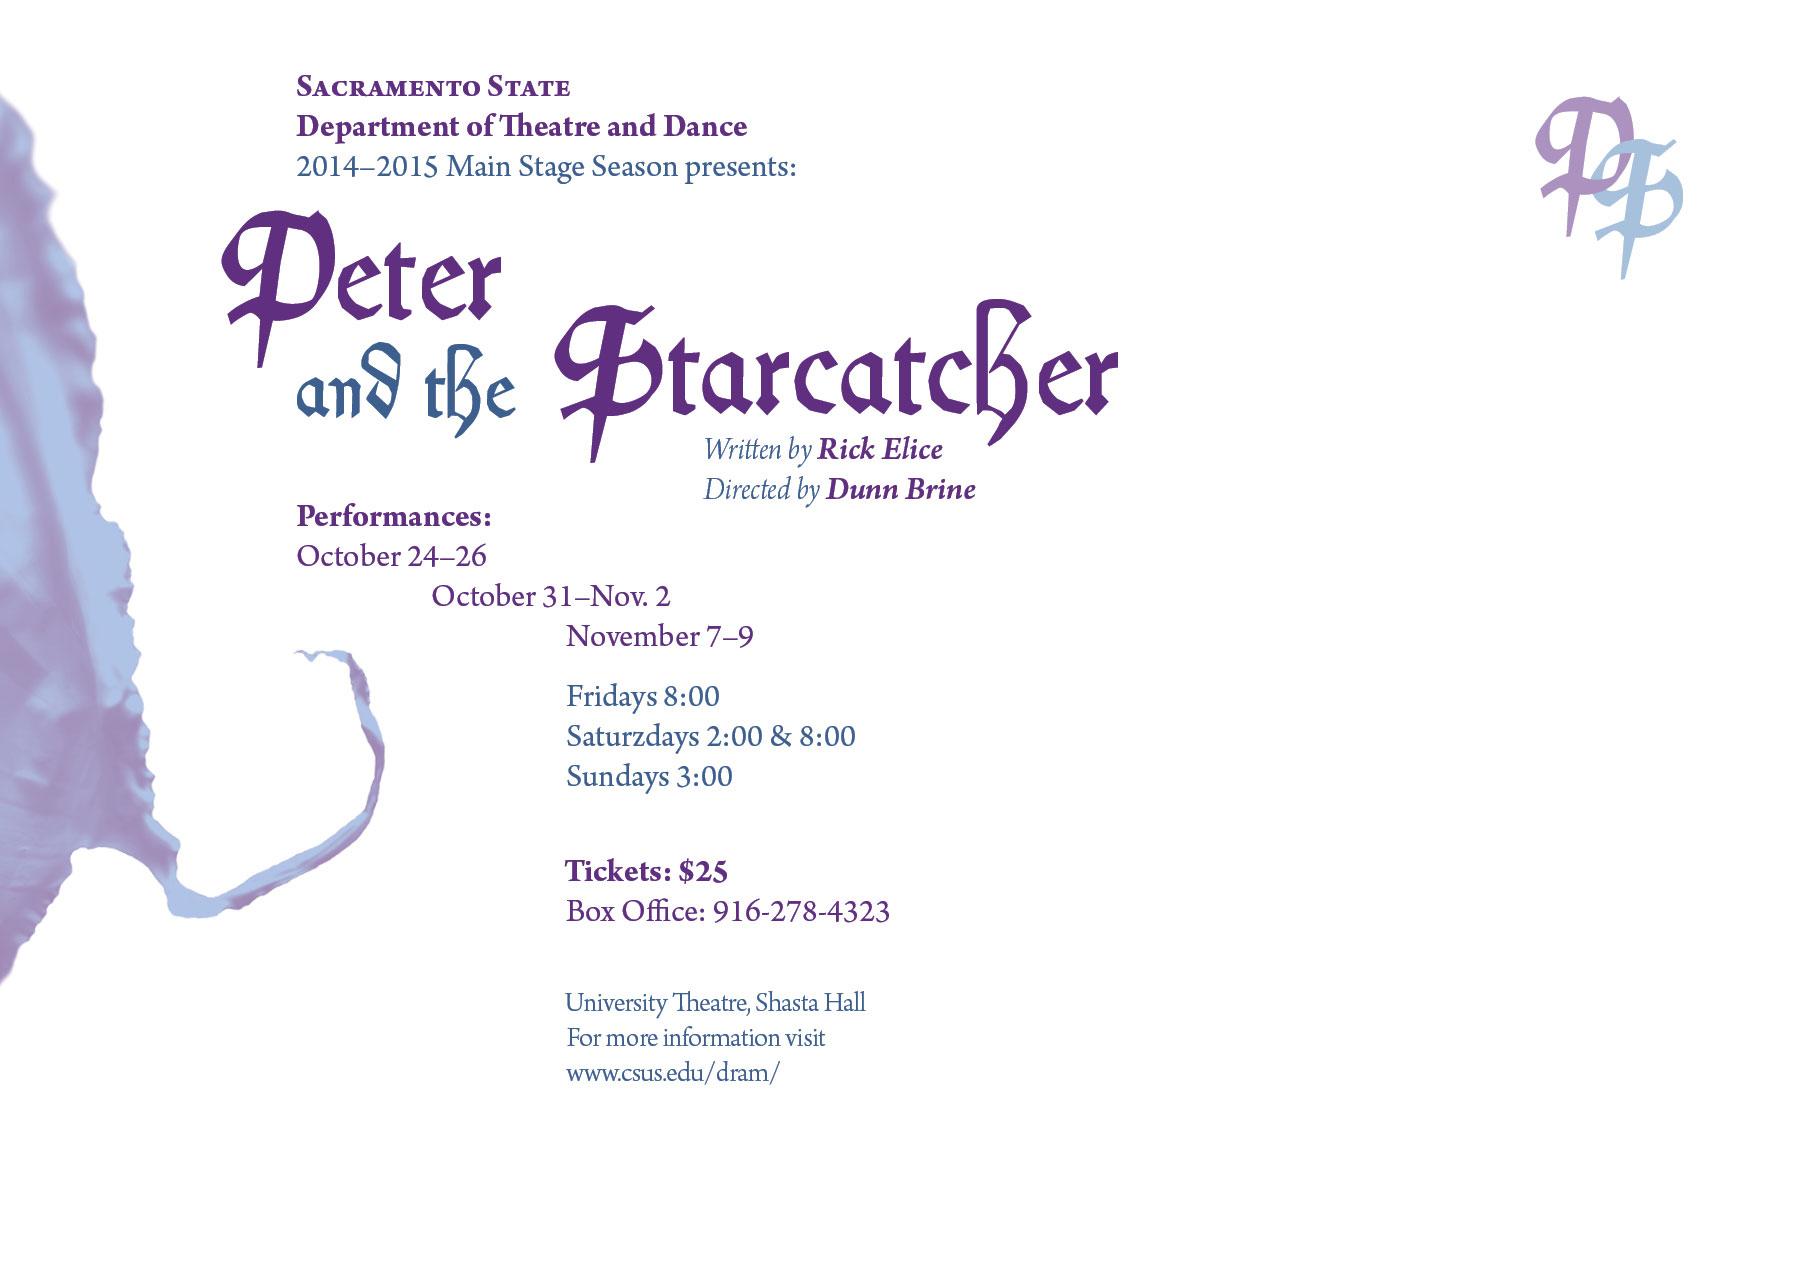 PeterStarCatcher4.jpg